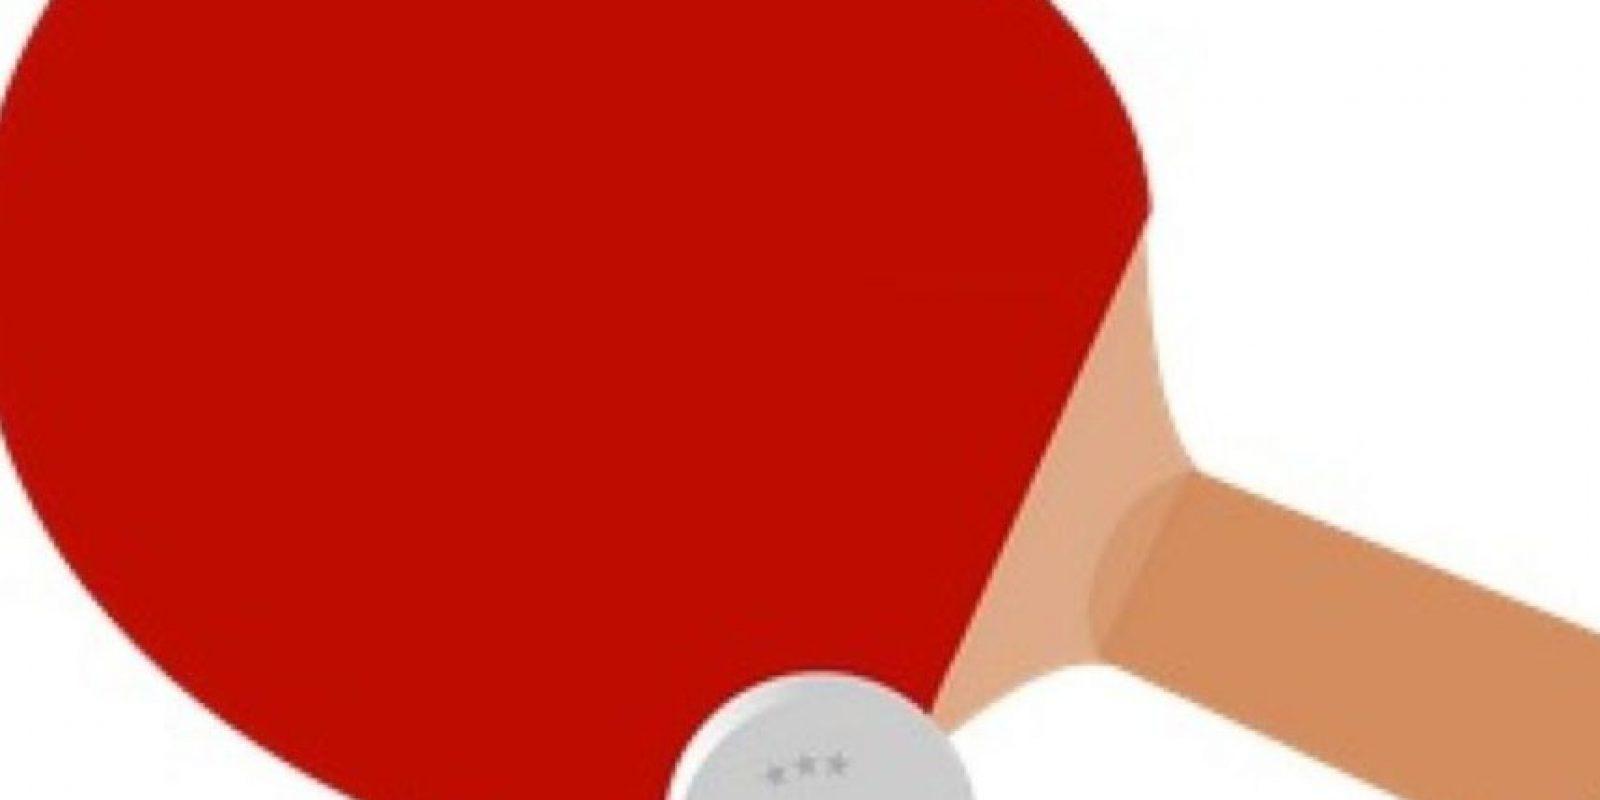 Raqueta de tenis de mesa Foto:emojipedia.org